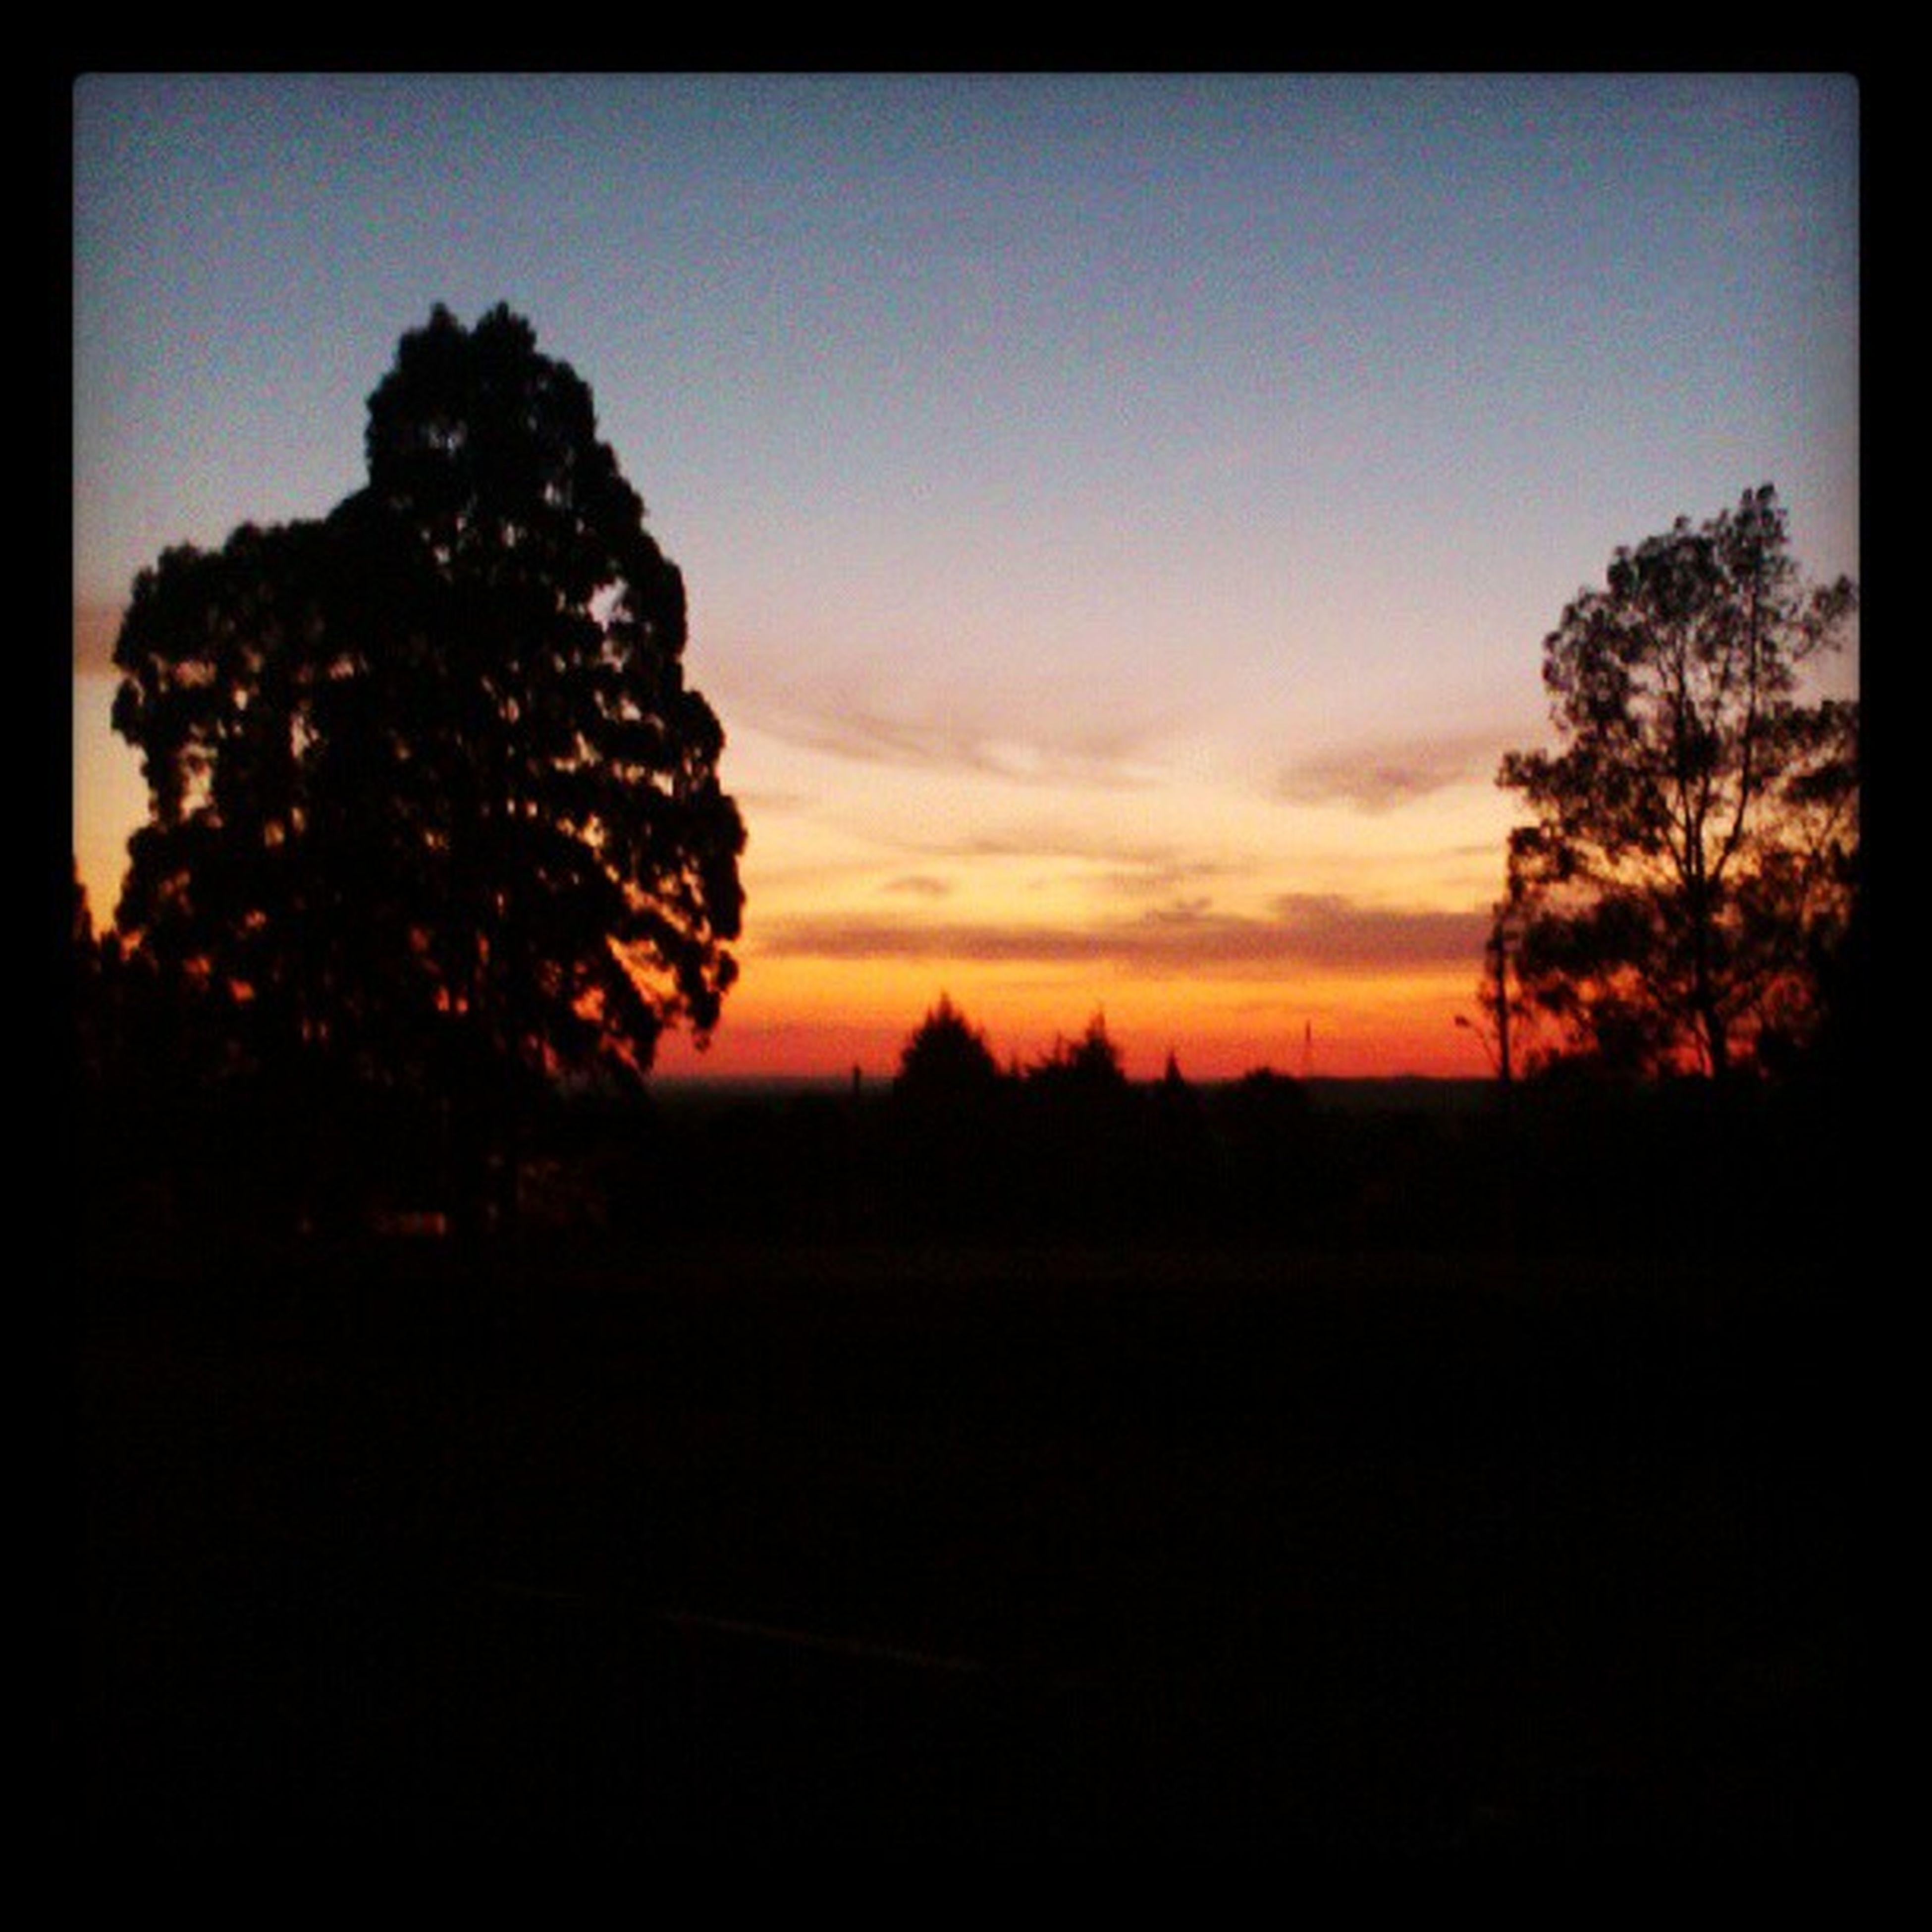 silhouette, sunset, tranquil scene, tranquility, tree, scenics, beauty in nature, sky, nature, landscape, orange color, idyllic, growth, transfer print, auto post production filter, outdoors, dark, non-urban scene, dusk, non urban scene